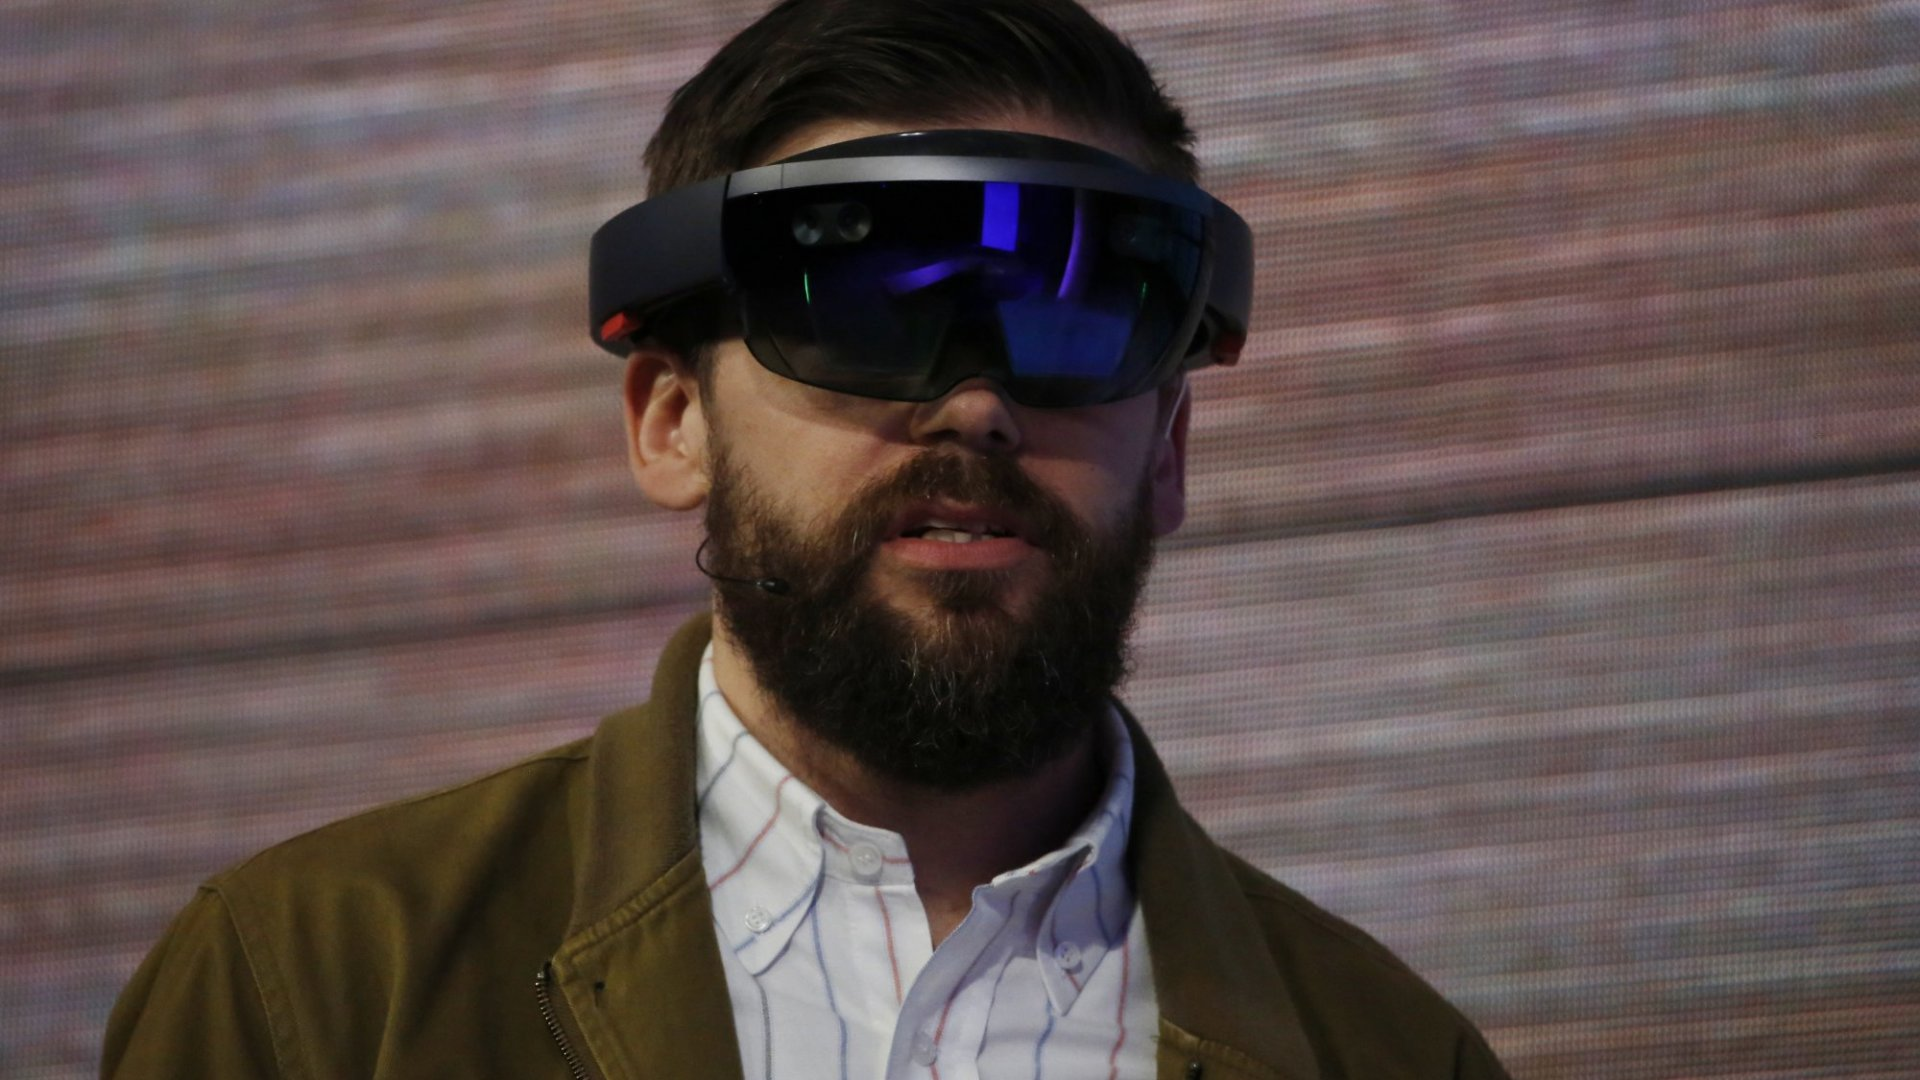 Microsoft HoloLens Finally Ships (to Developers) Soon